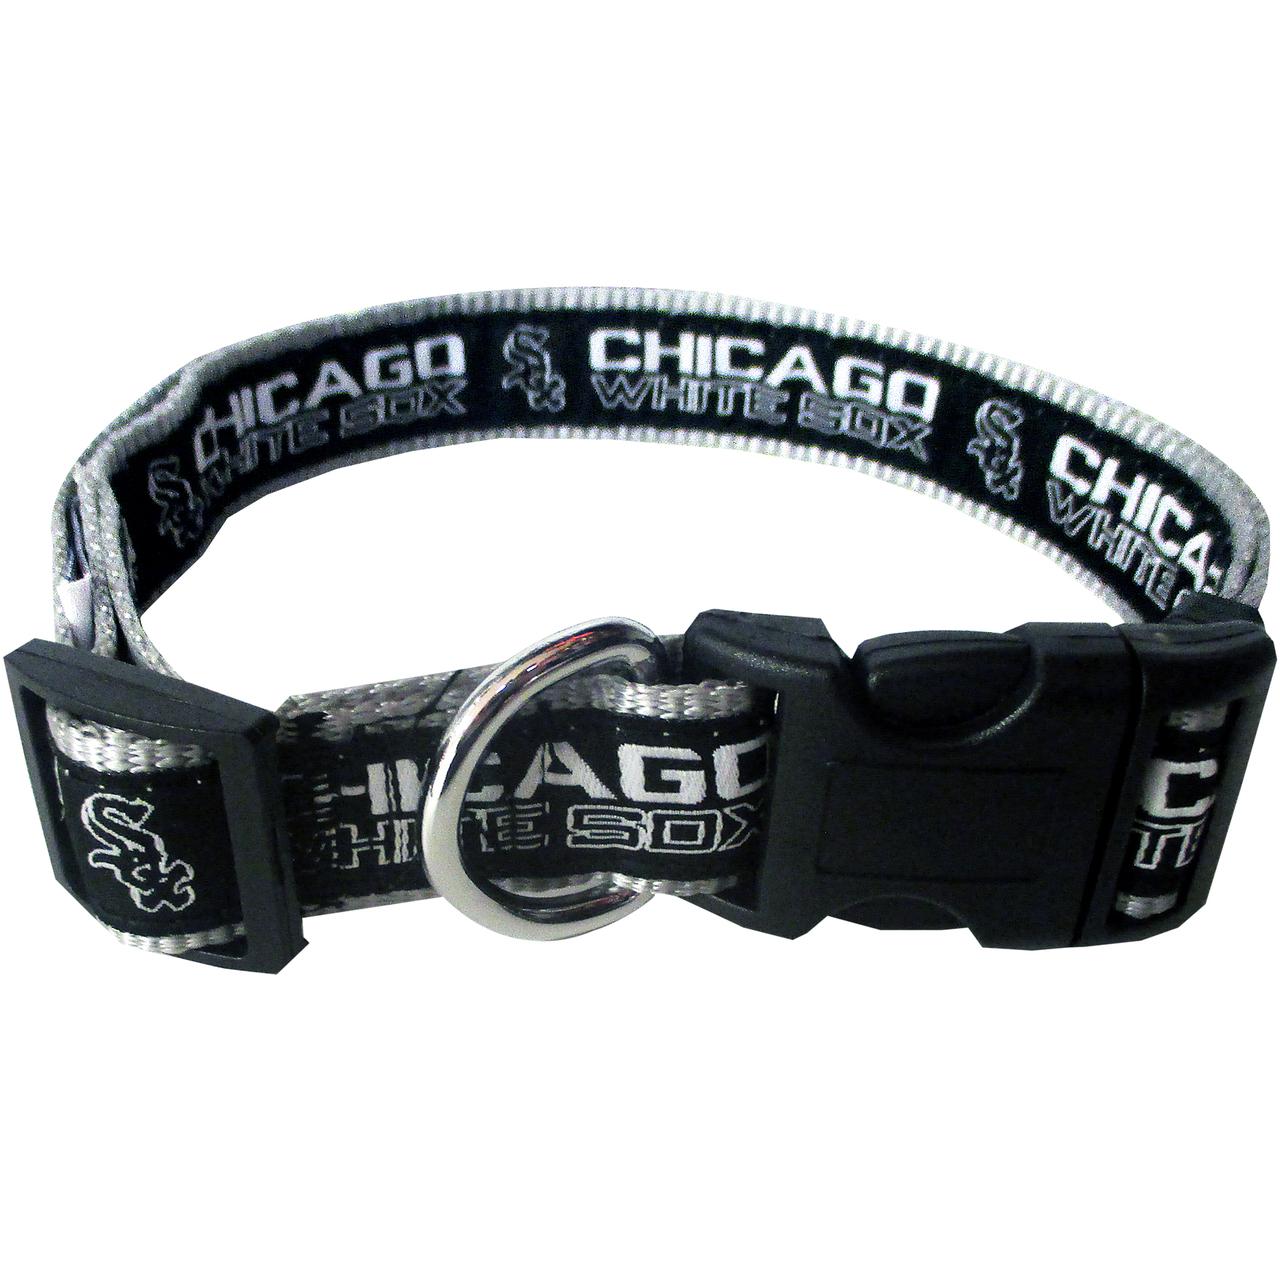 chicago-white-sox-dog-collar